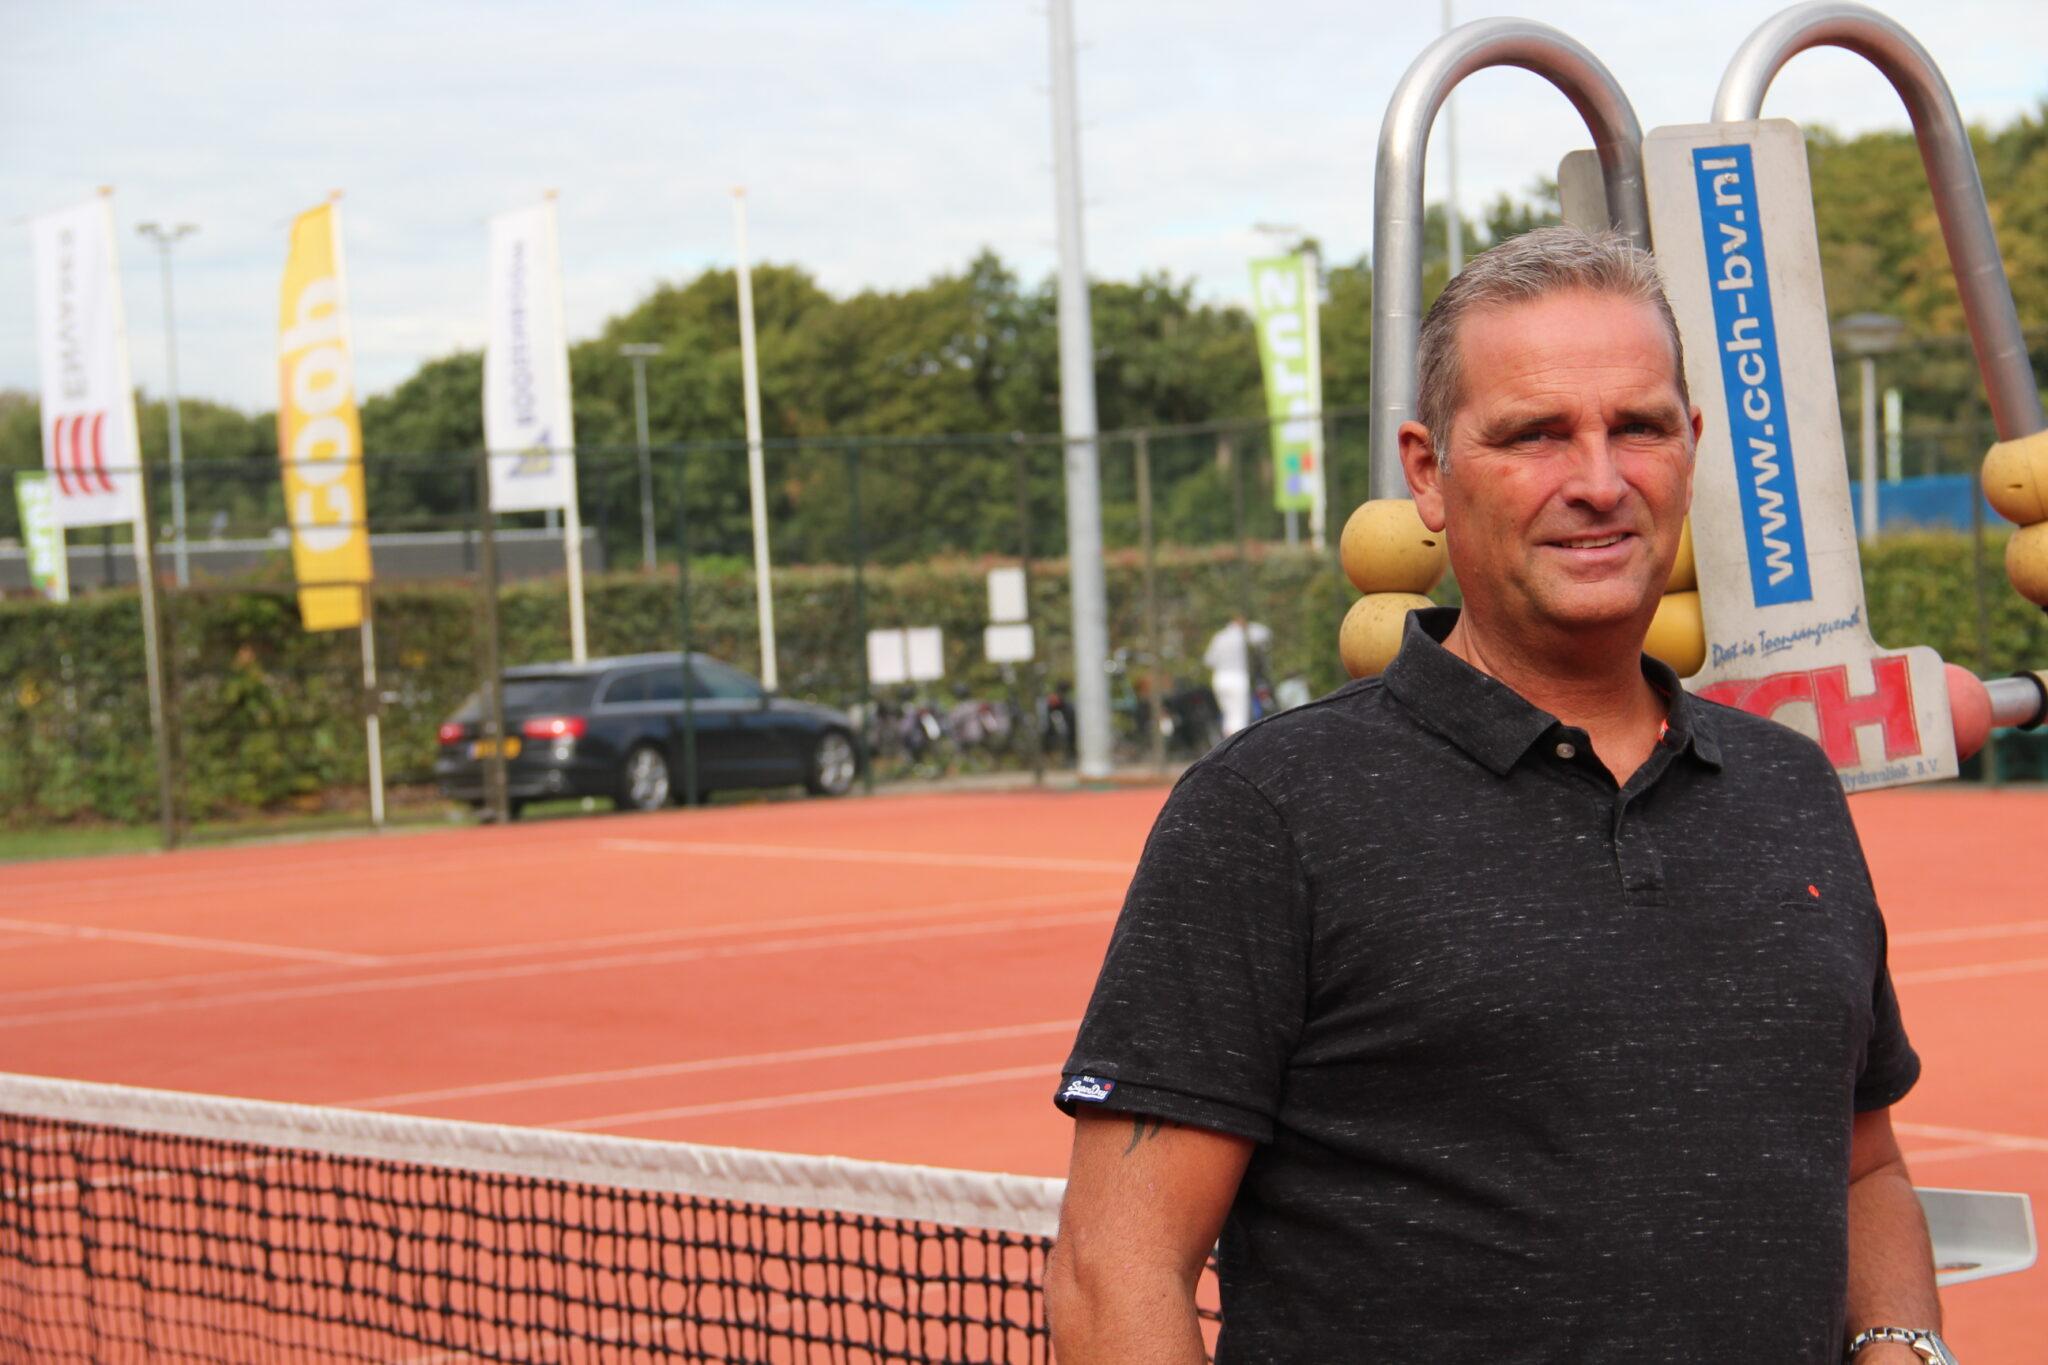 Rabo ClubSupport halsterse tennis vereniging marco van elzakker tennisvereniging halsteren tennisbaan